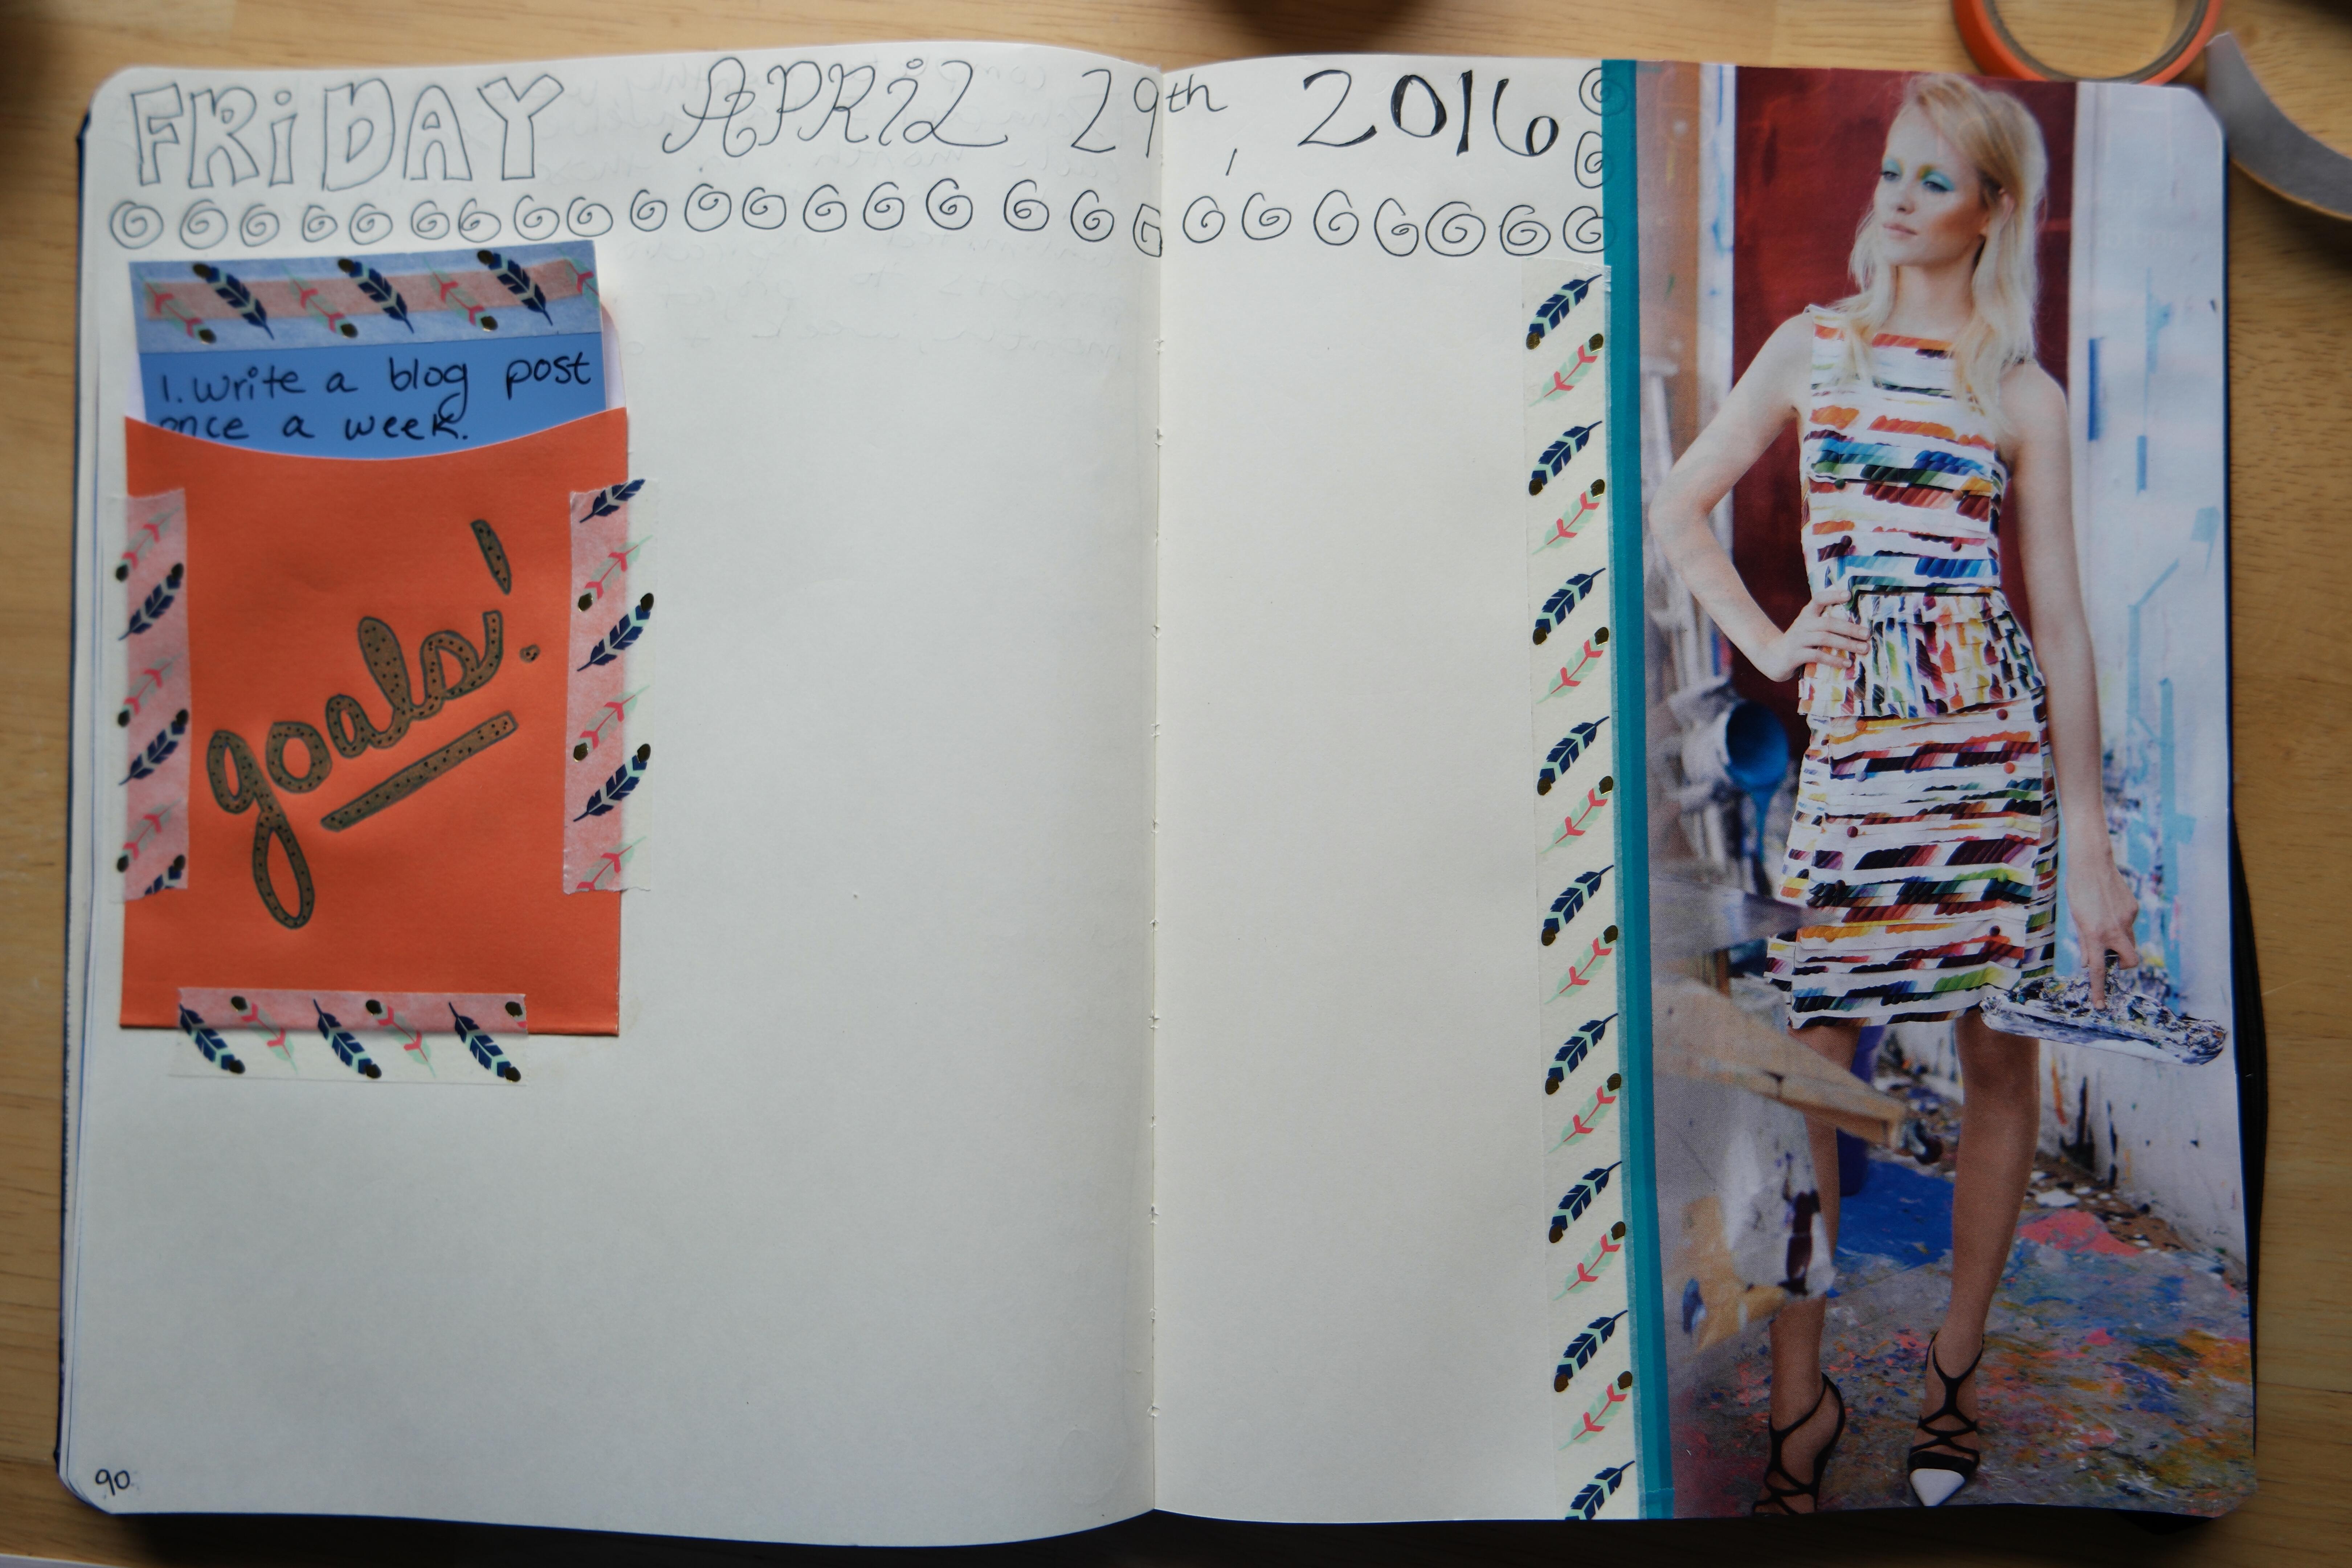 Creative goal-setting in my visual notebook